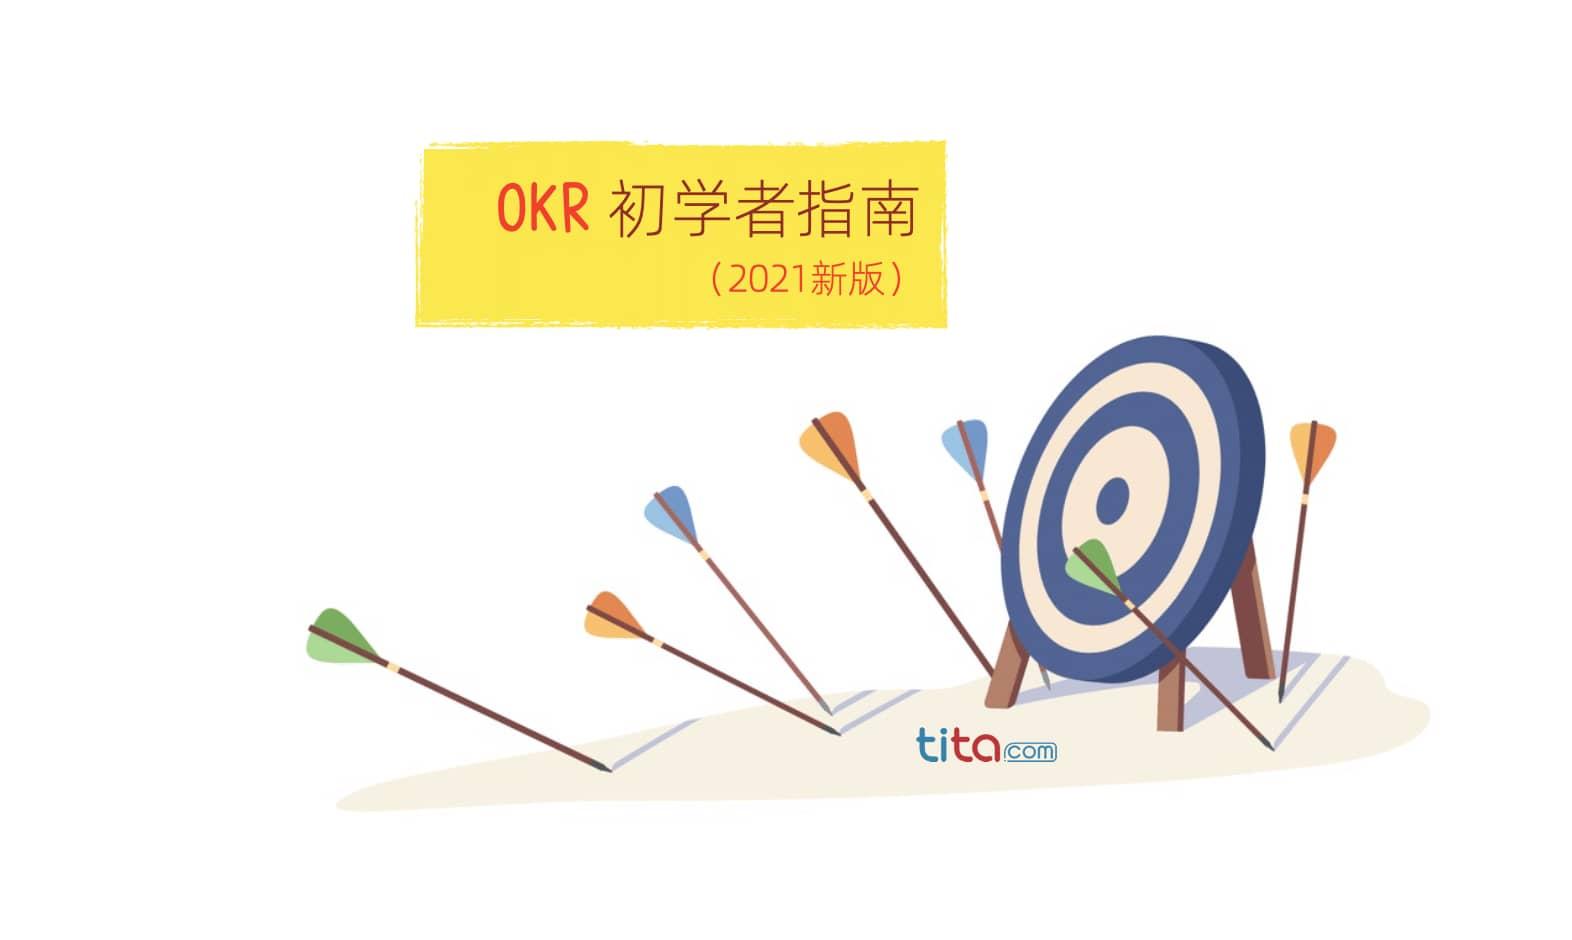 2021,OKR 初学者指南(建议收藏)